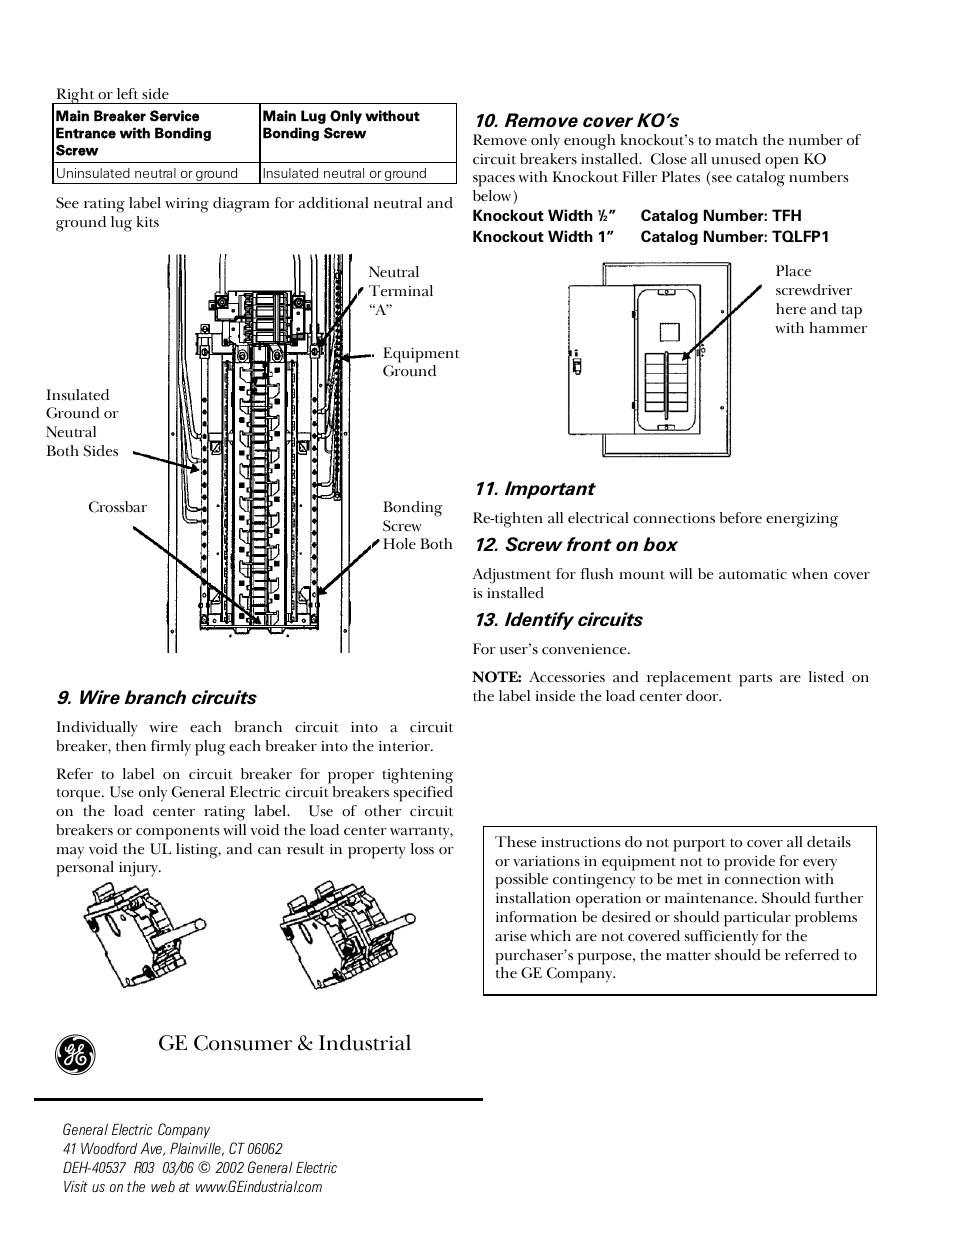 medium resolution of general electric circuit breakers diagram wiring diagram general electric circuit breakers diagram